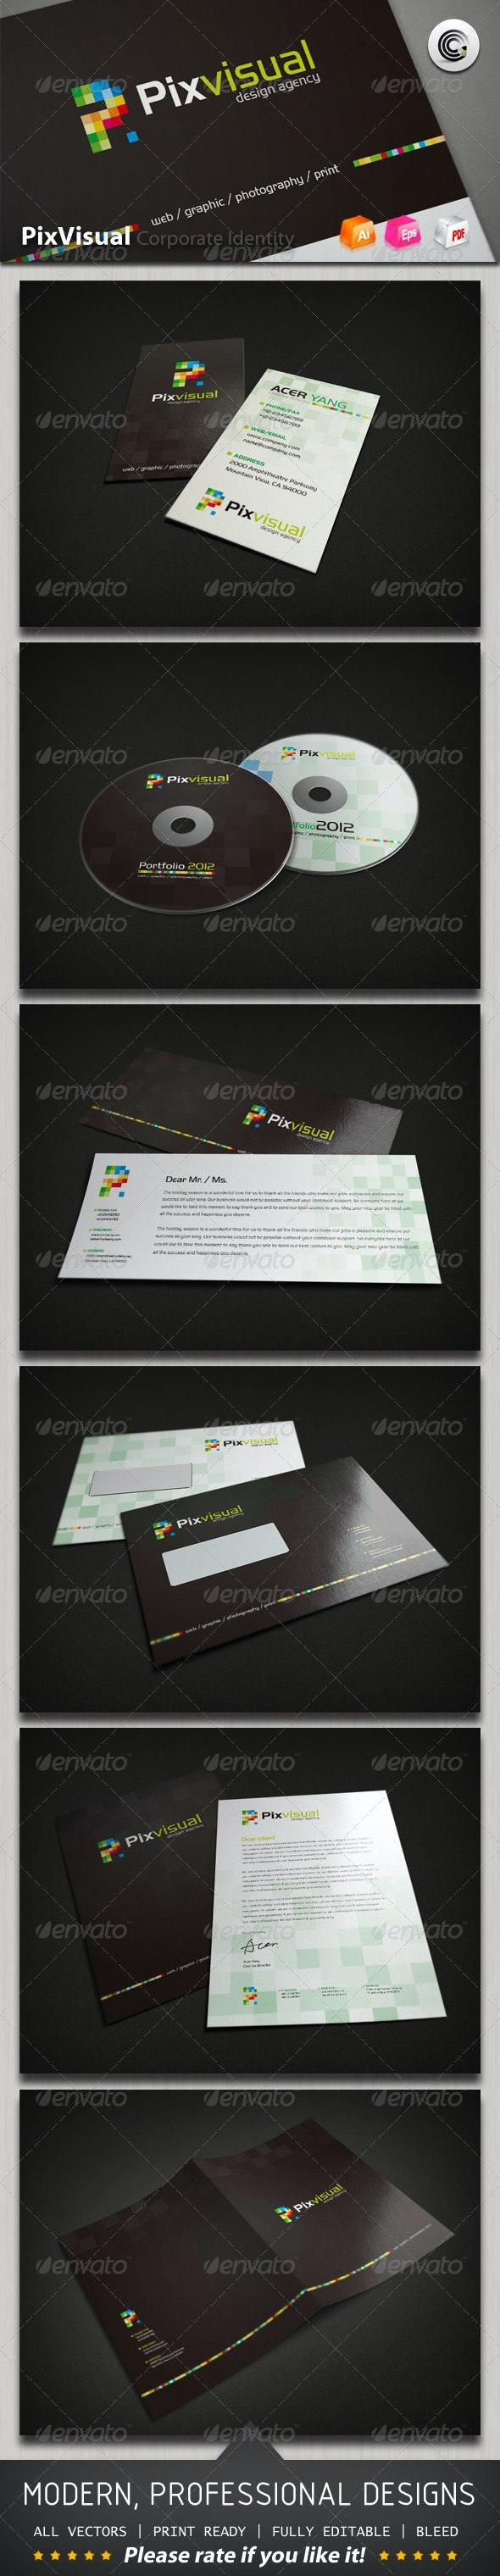 Pix Visual Design Agency Corporate Identity - Stationery Print Templates